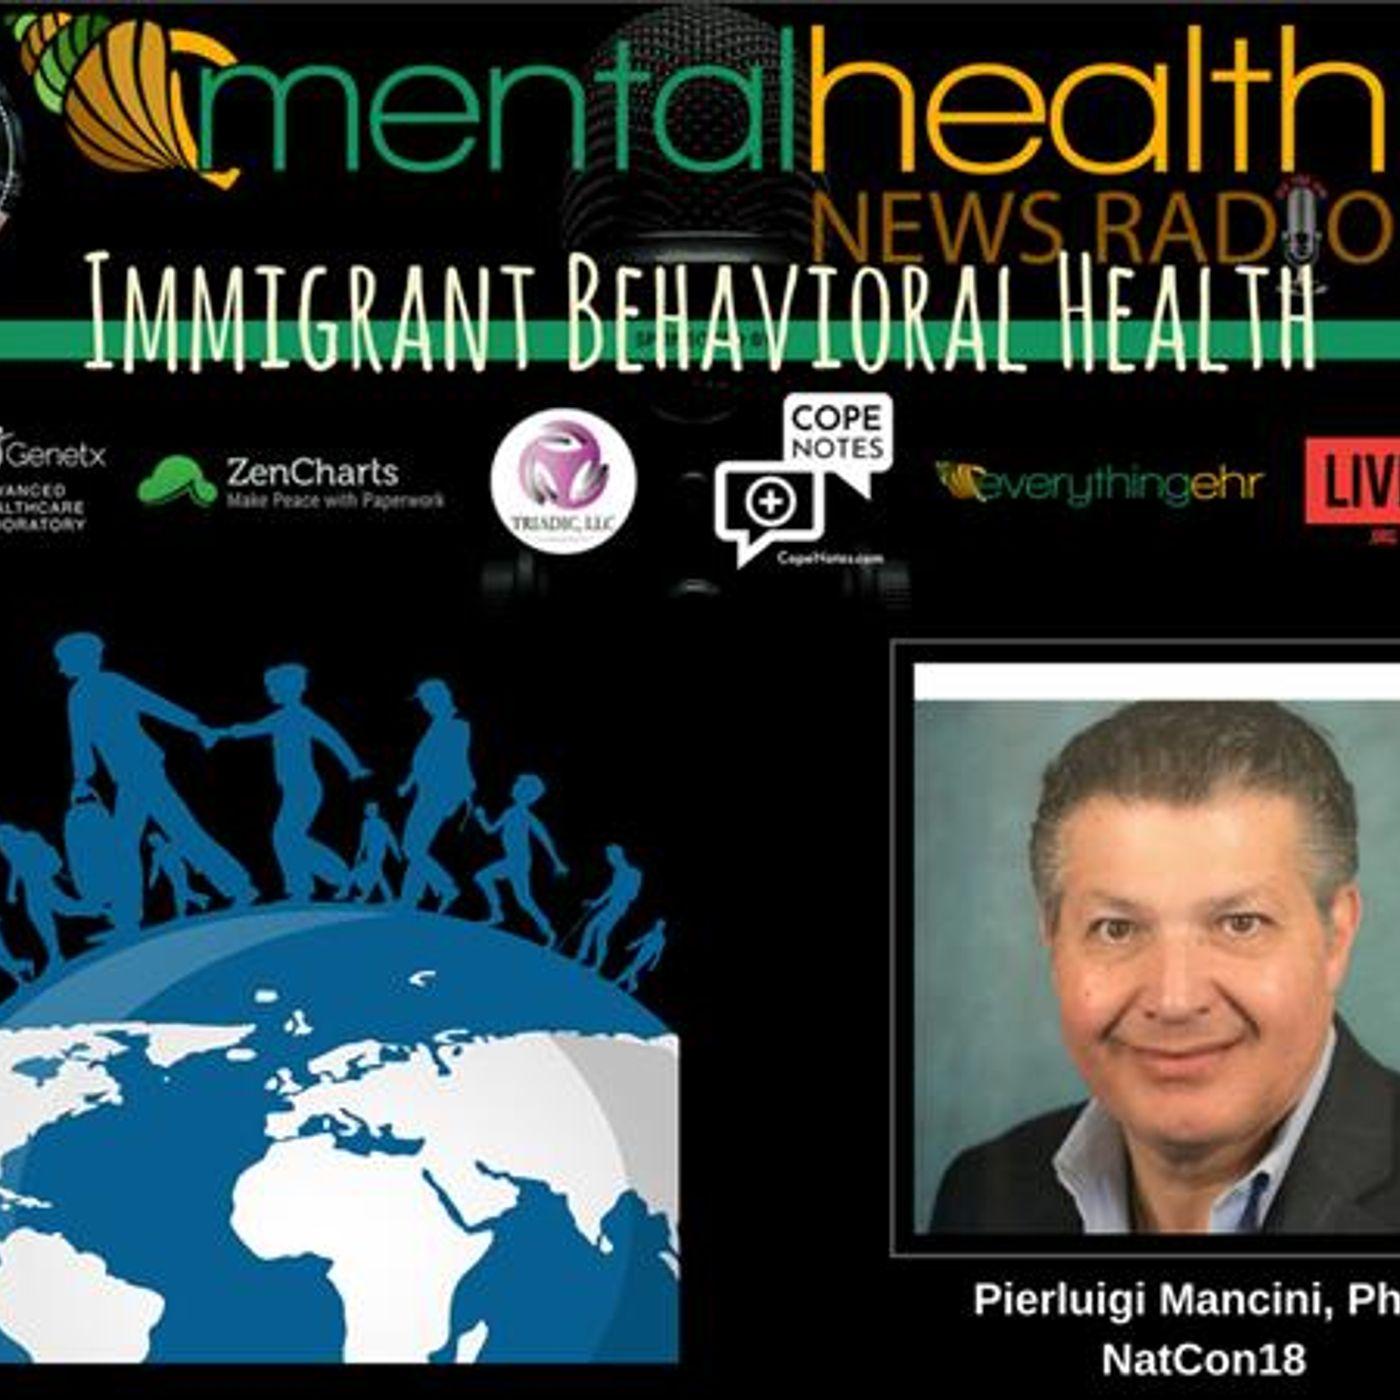 Mental Health News Radio - Immigrant Behavioral Health with Pierluigi Mancini, PhD